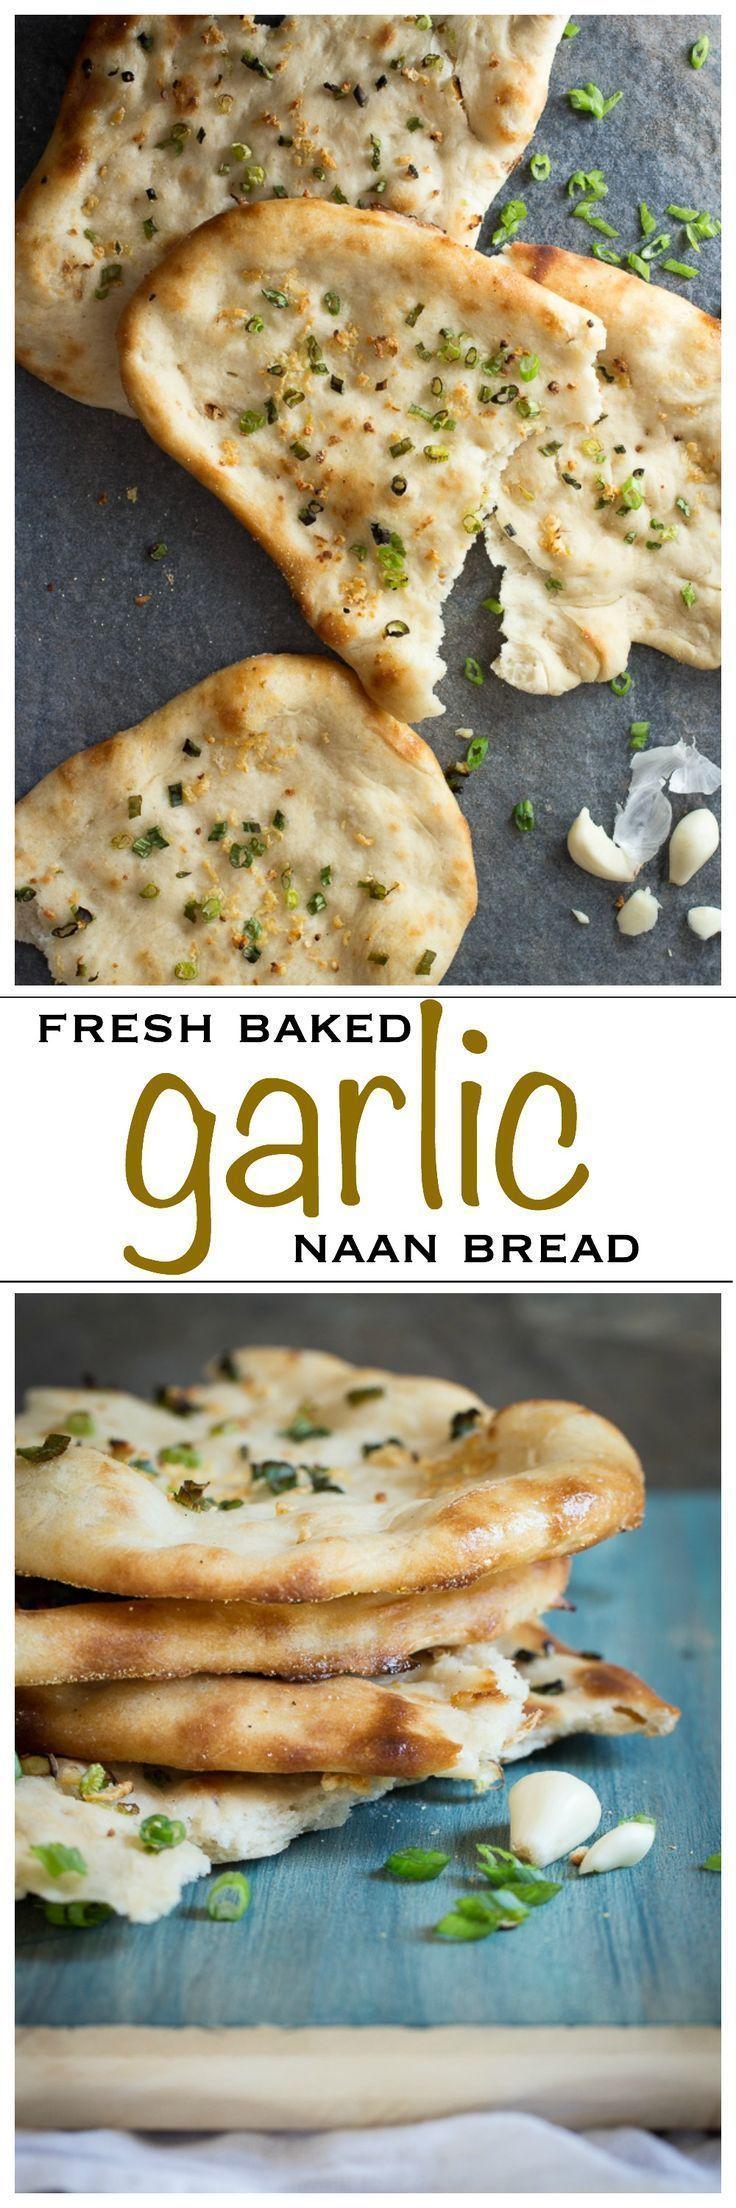 Fresh Baked Homemade Garlic Naan Bread | Foodness Gracious